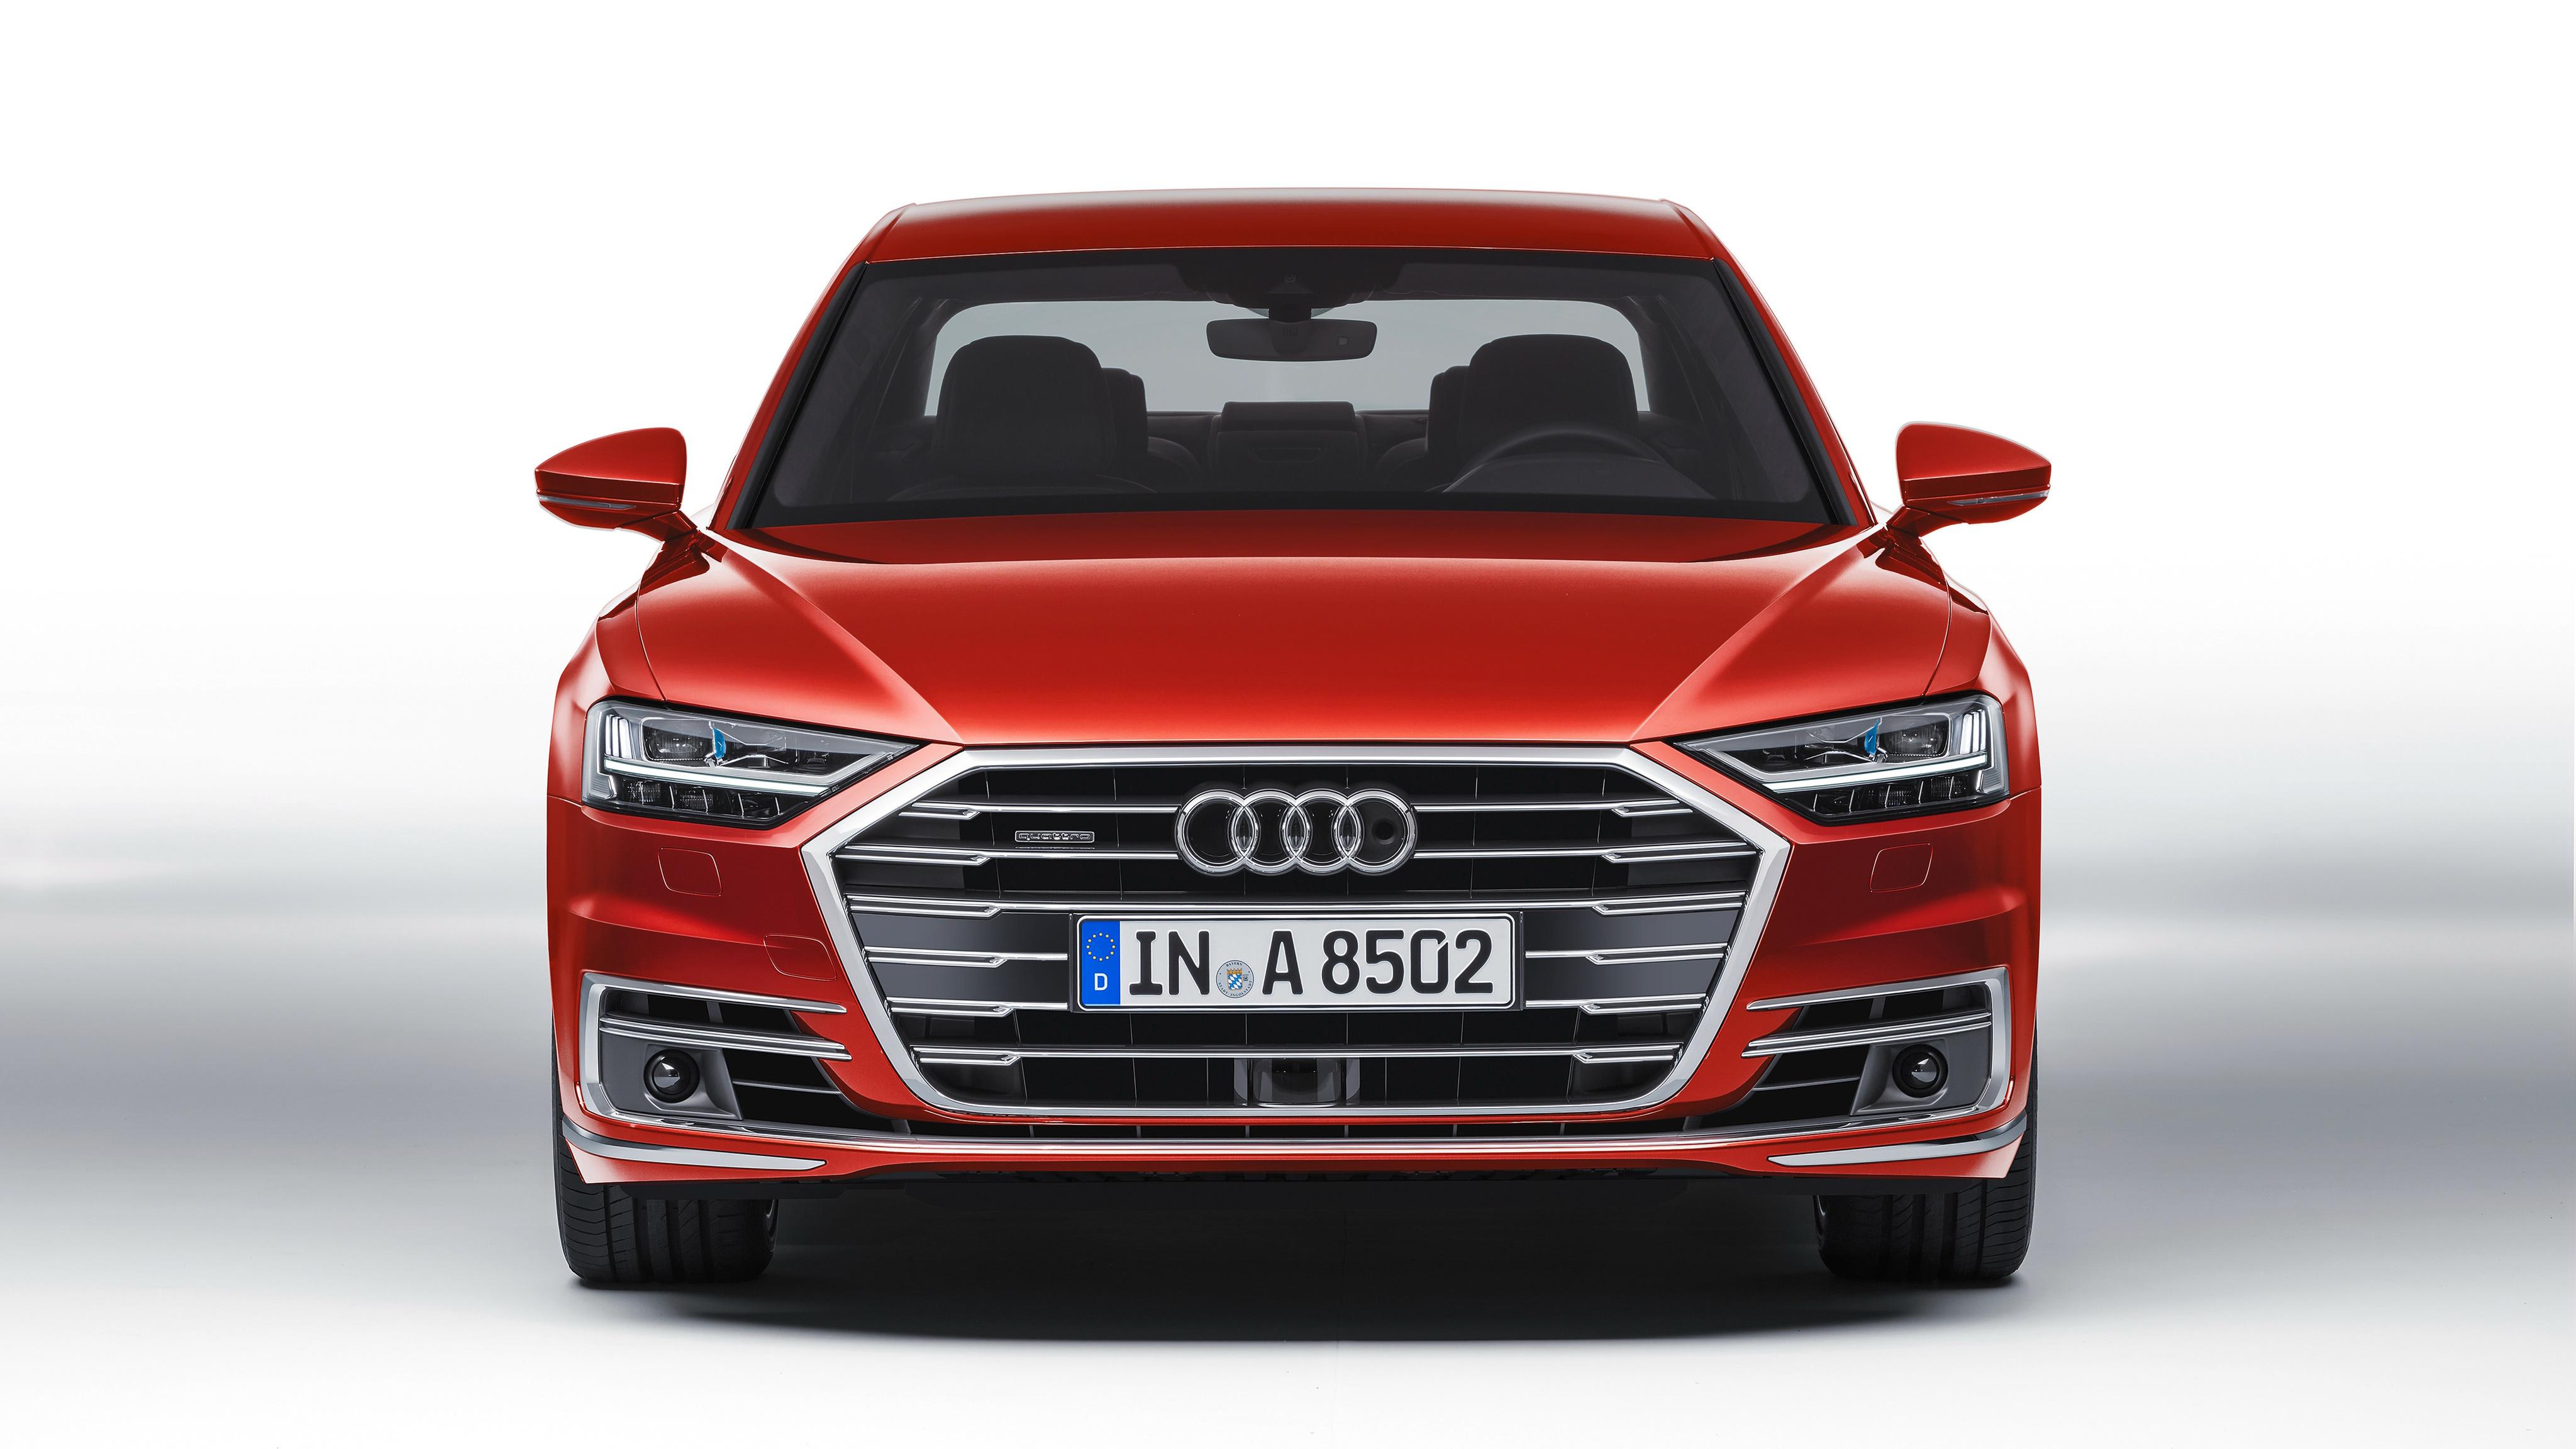 Audi R8 Wallpaper Iphone 6 Audi A8 Tdi Quattro 2017 4k Wallpaper Hd Car Wallpapers